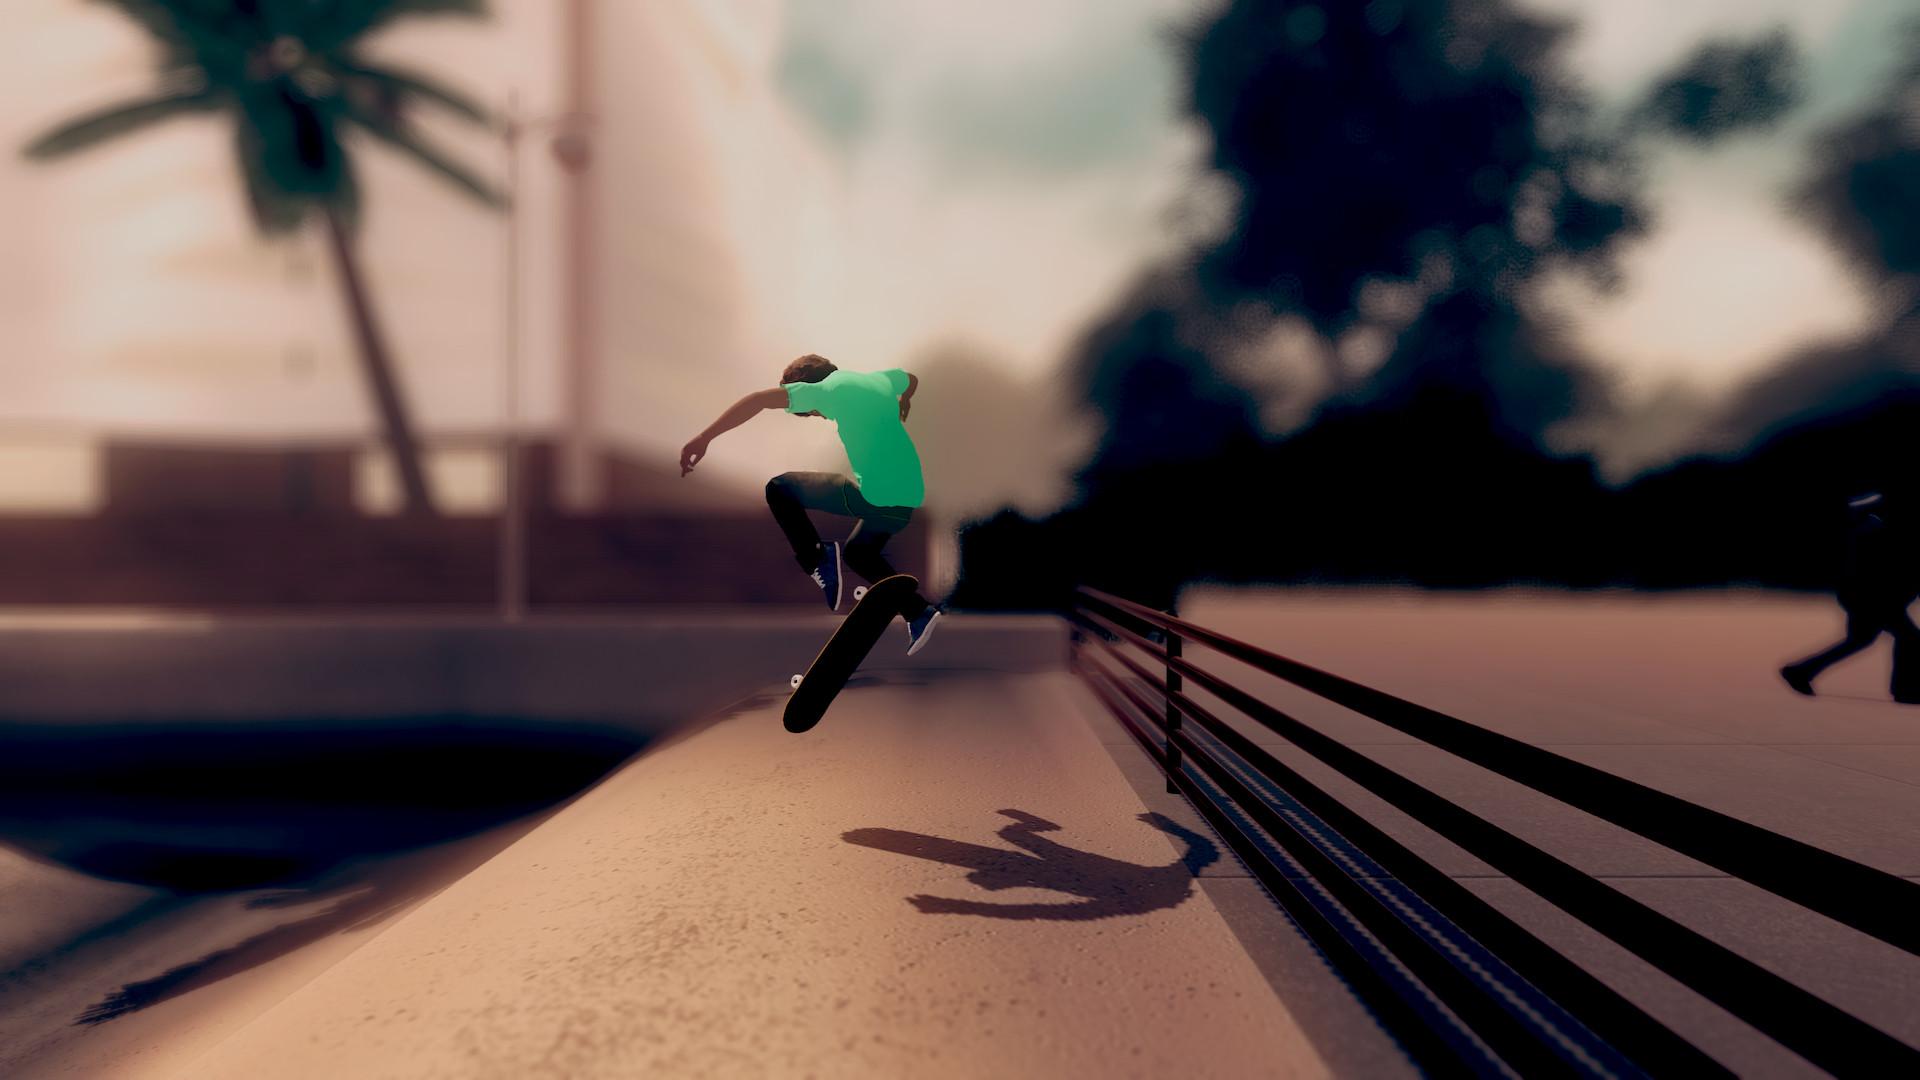 skate city coming soon 2